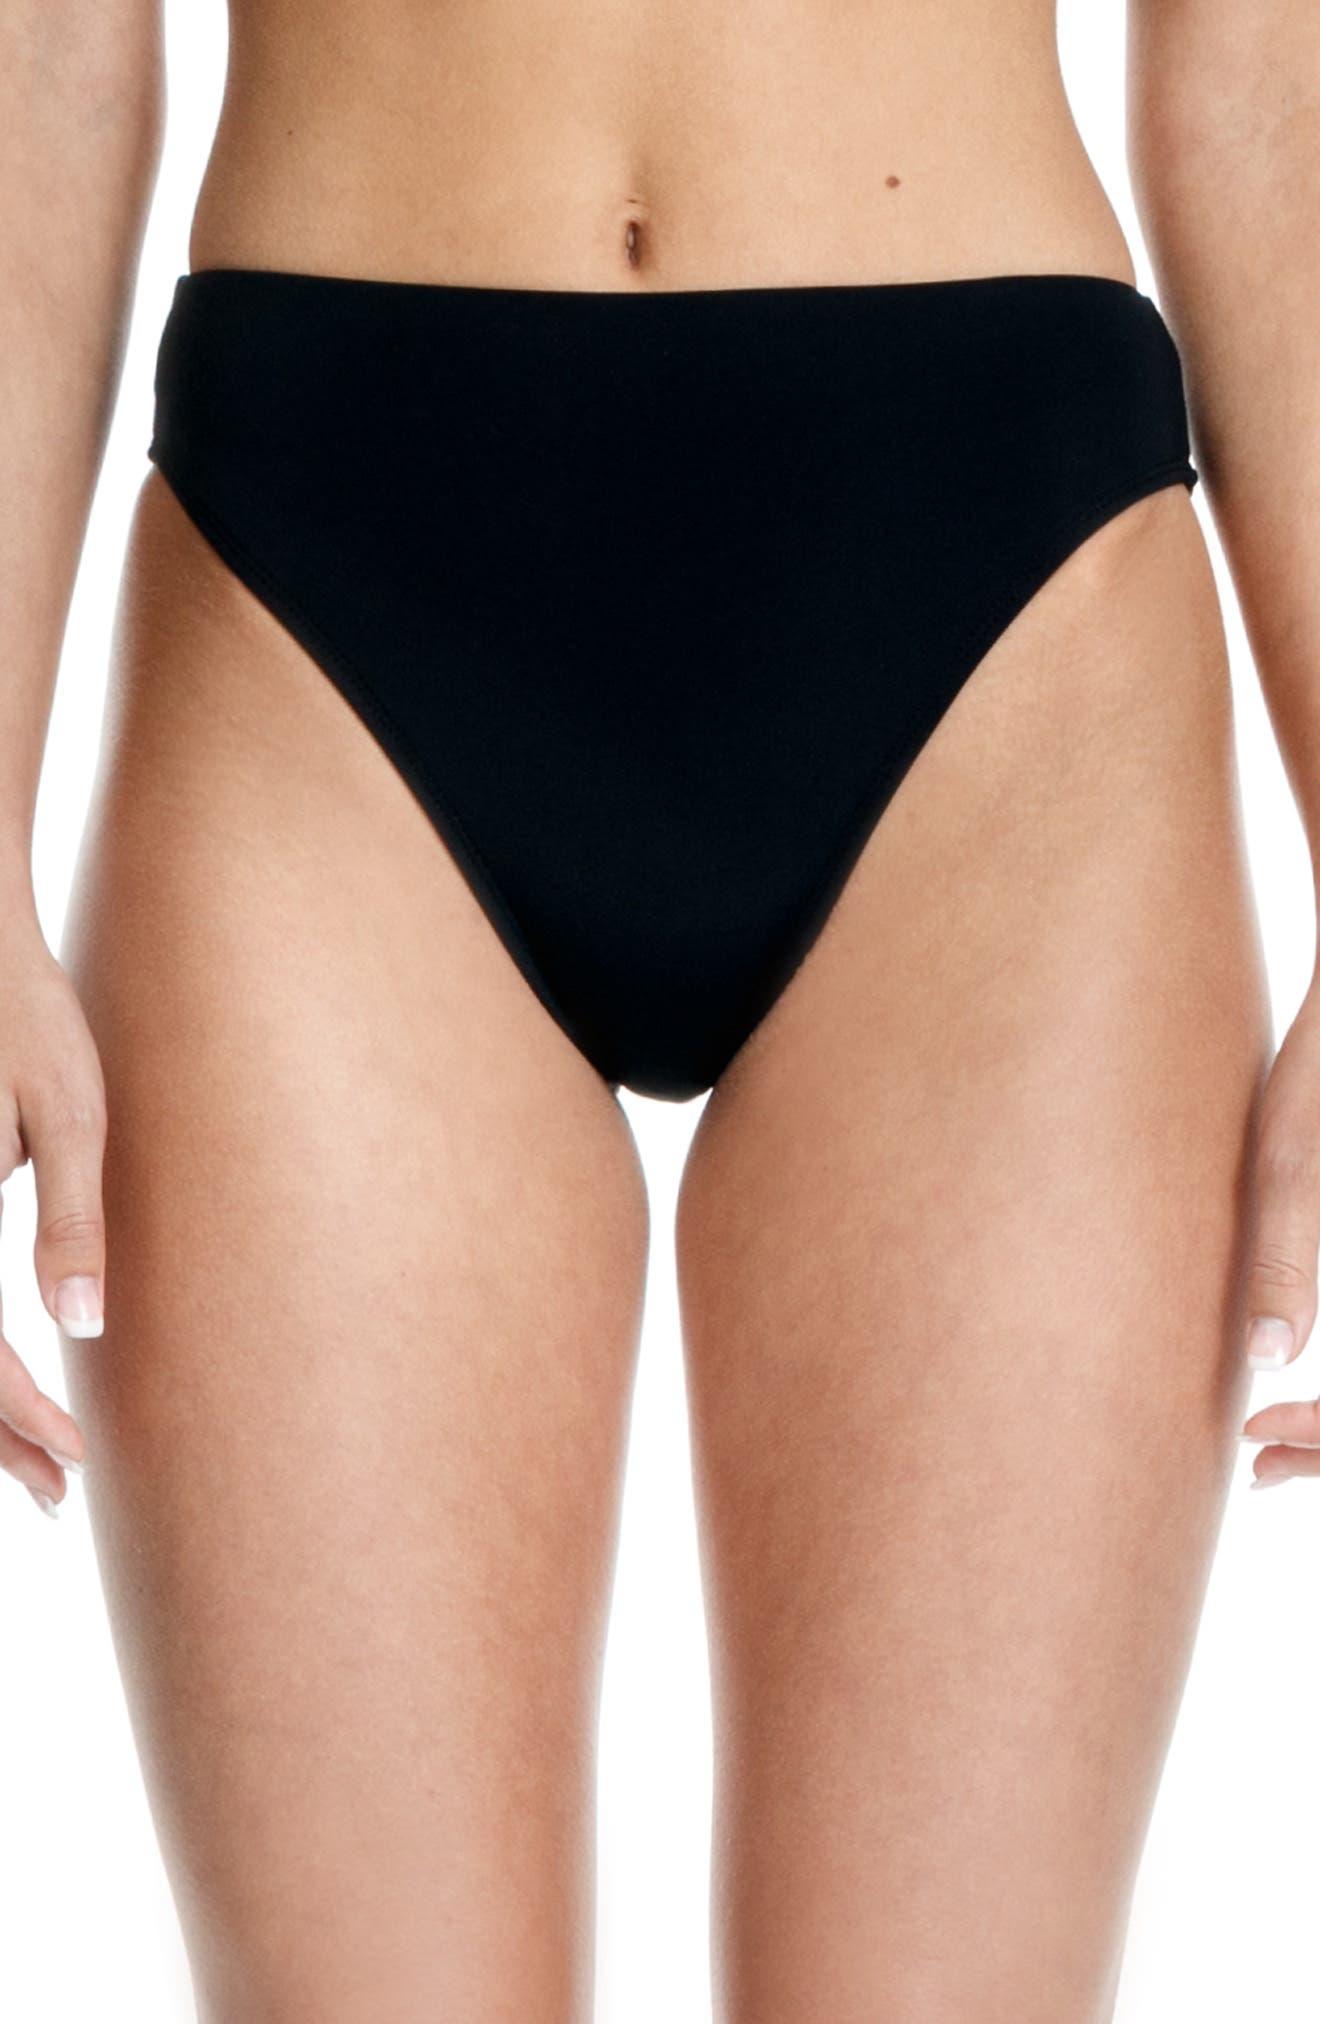 BETH RICHARDS, Heather High Waist Bikini Bottoms, Main thumbnail 1, color, BLACK